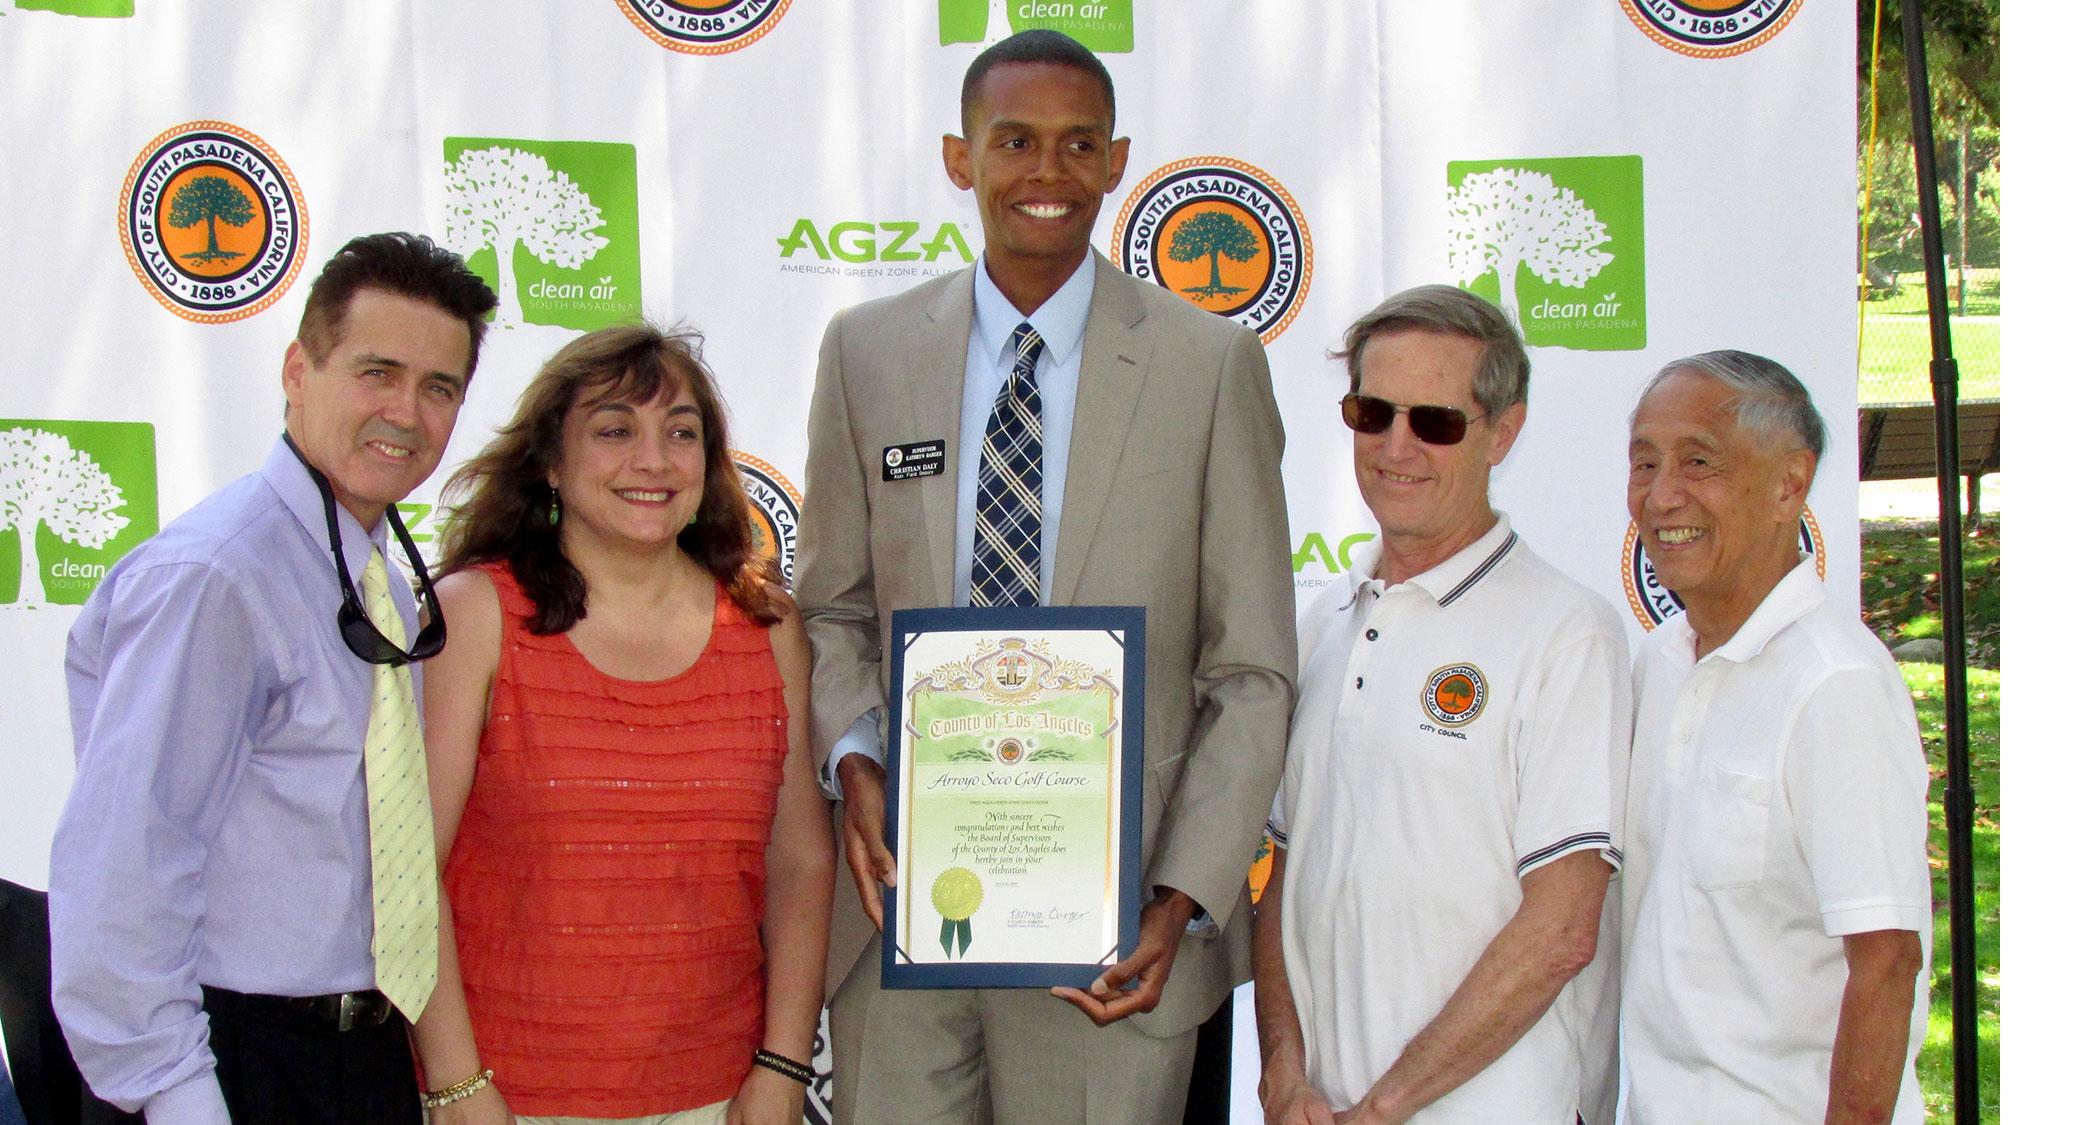 AGZA_GZ_ASGC_certificate_LA_County_Board_of_Supervisors_2000_margin.jpg